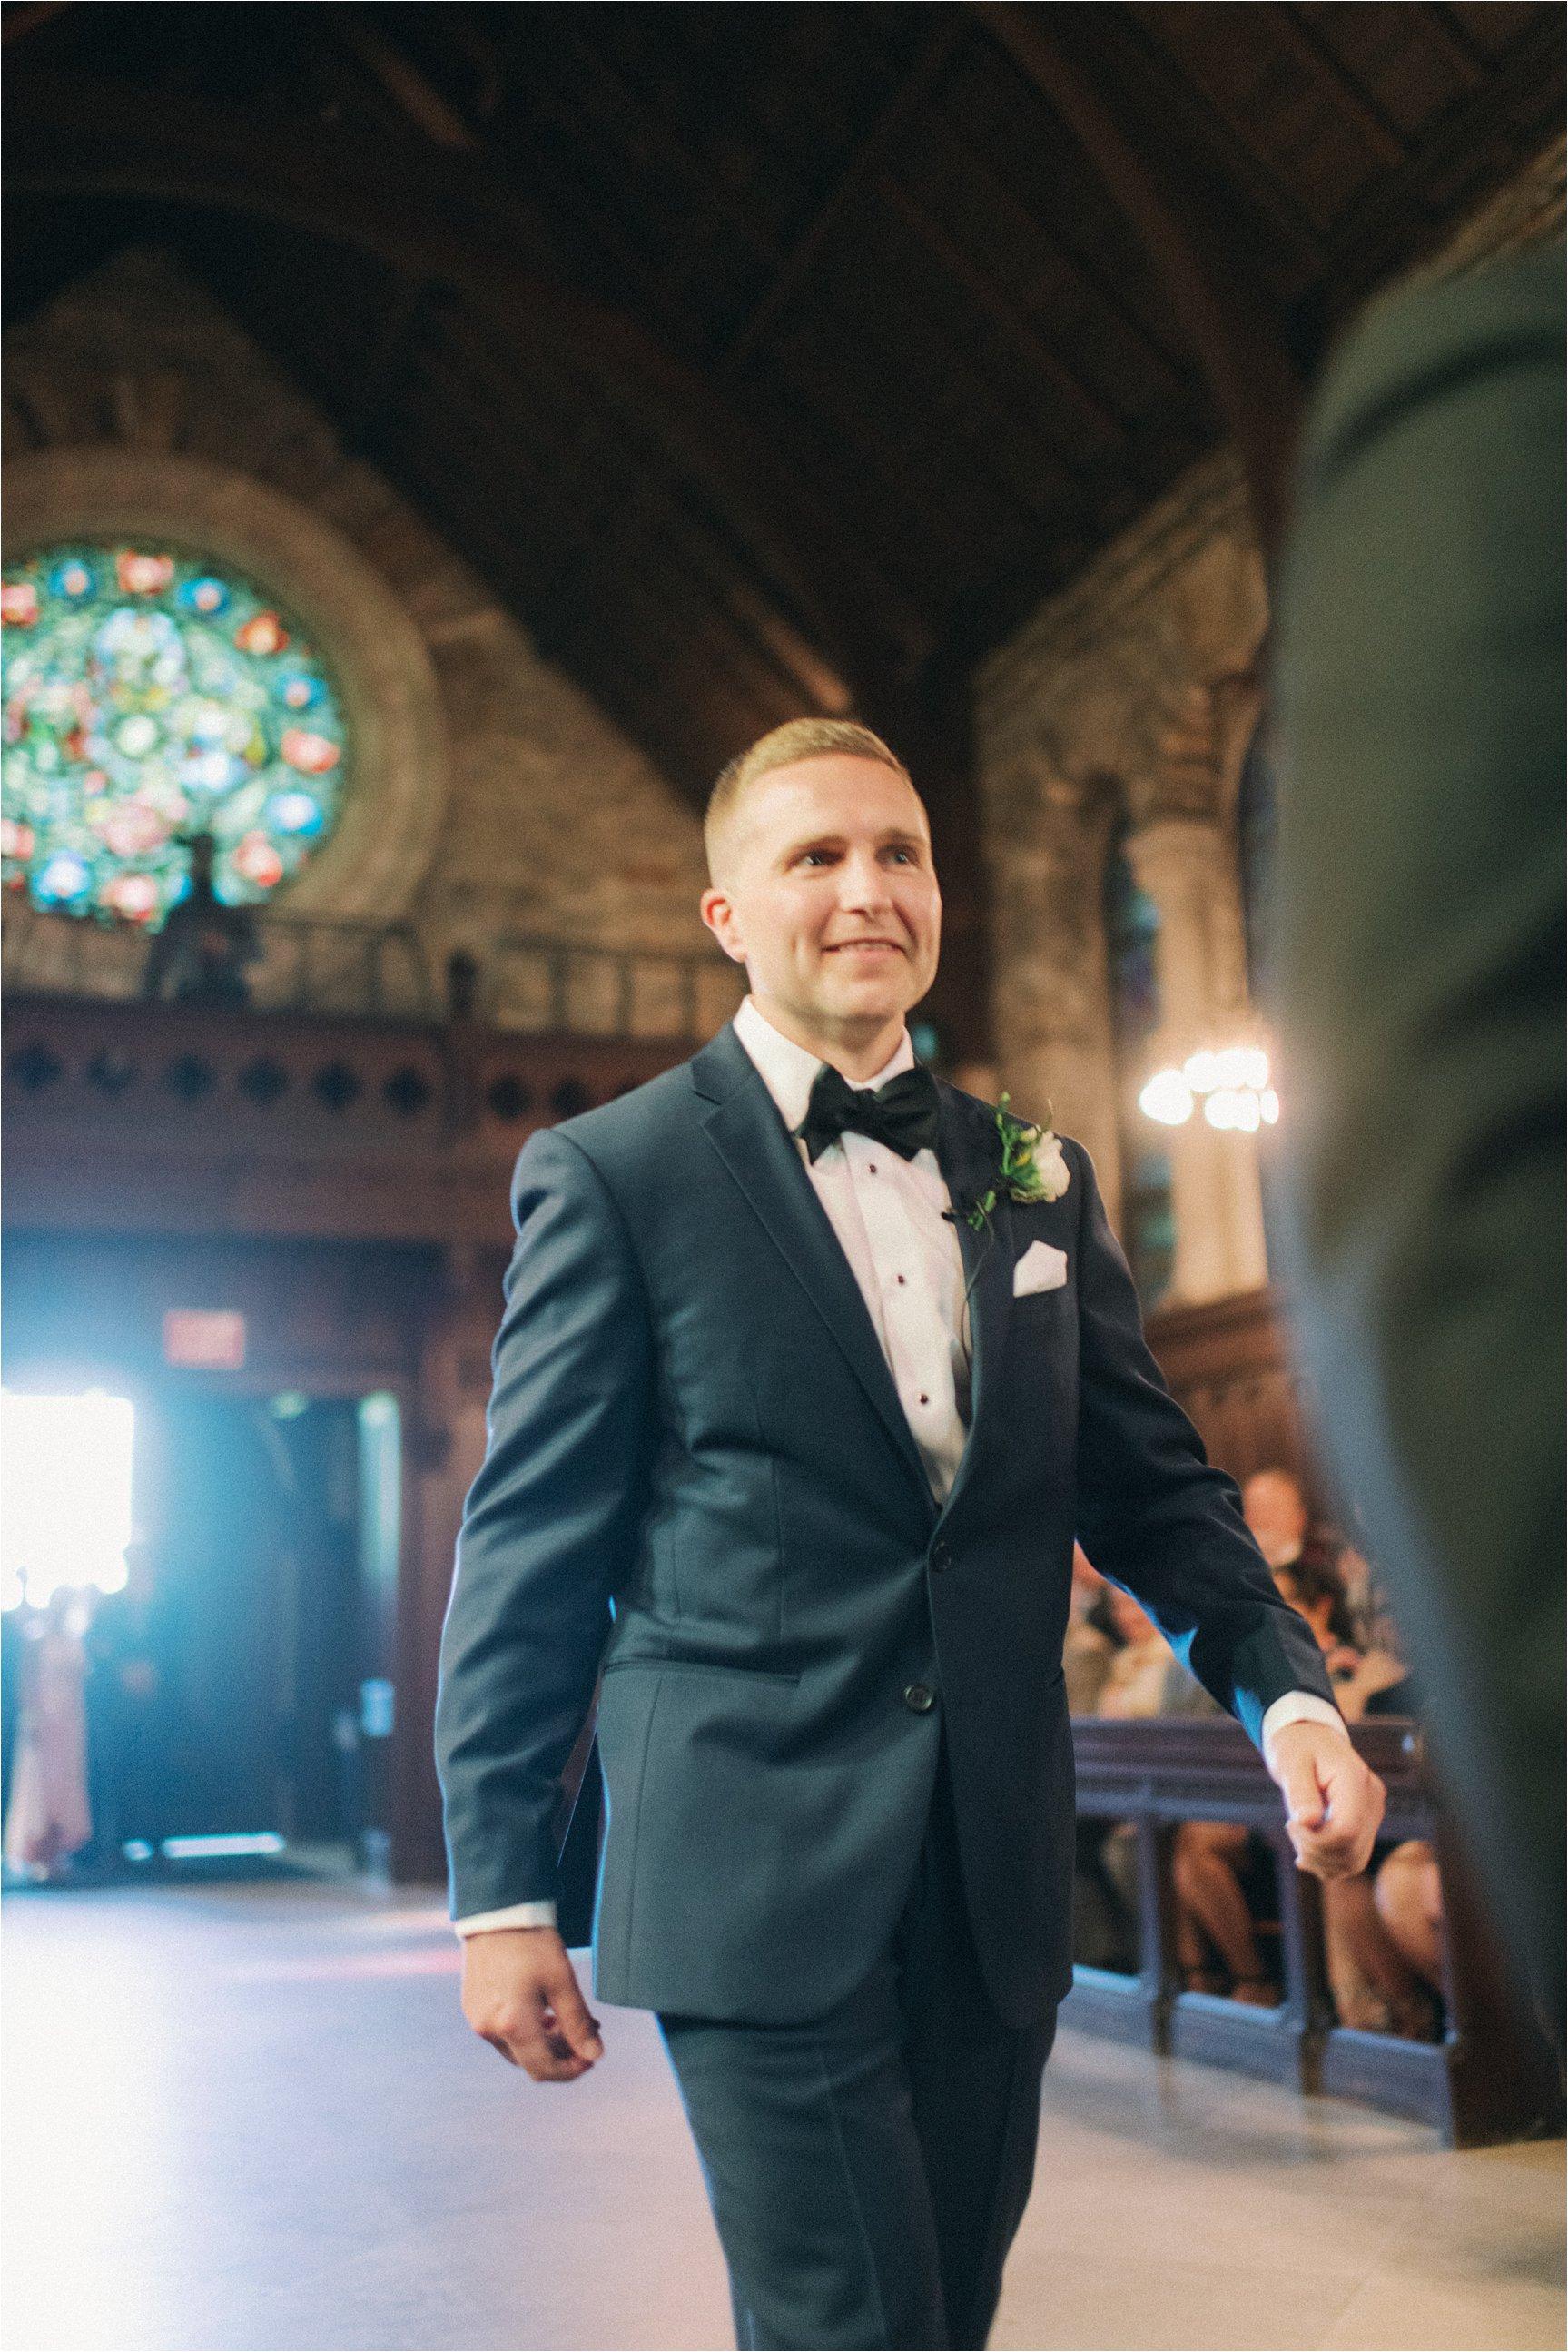 Lord_Thompson_Manor_Wedding069.JPG